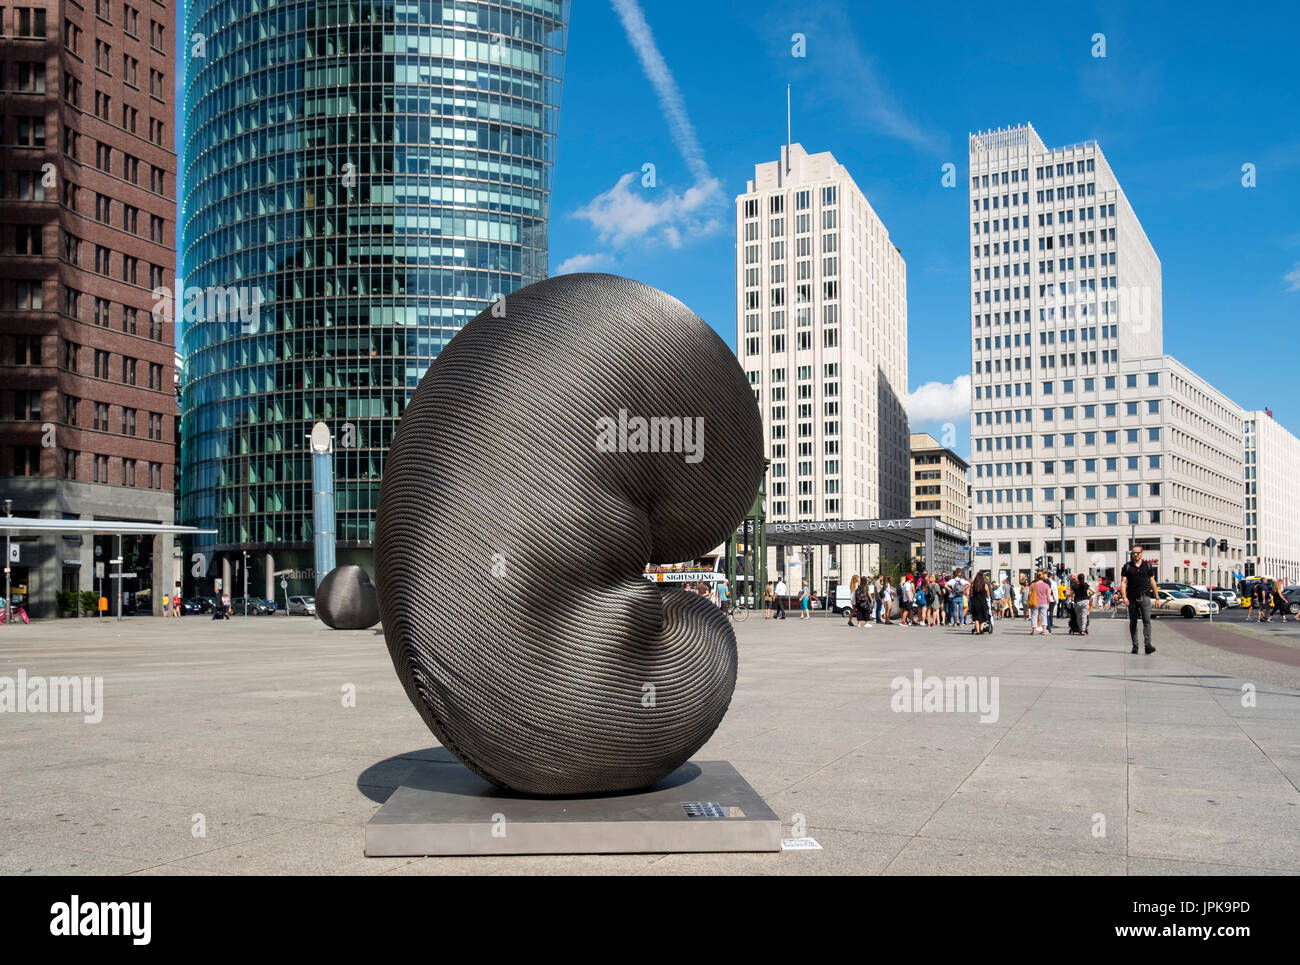 Modern art installation sculpture by Kang Muxiang at Potsdamer Platz in Berlin, Germany - Stock Image